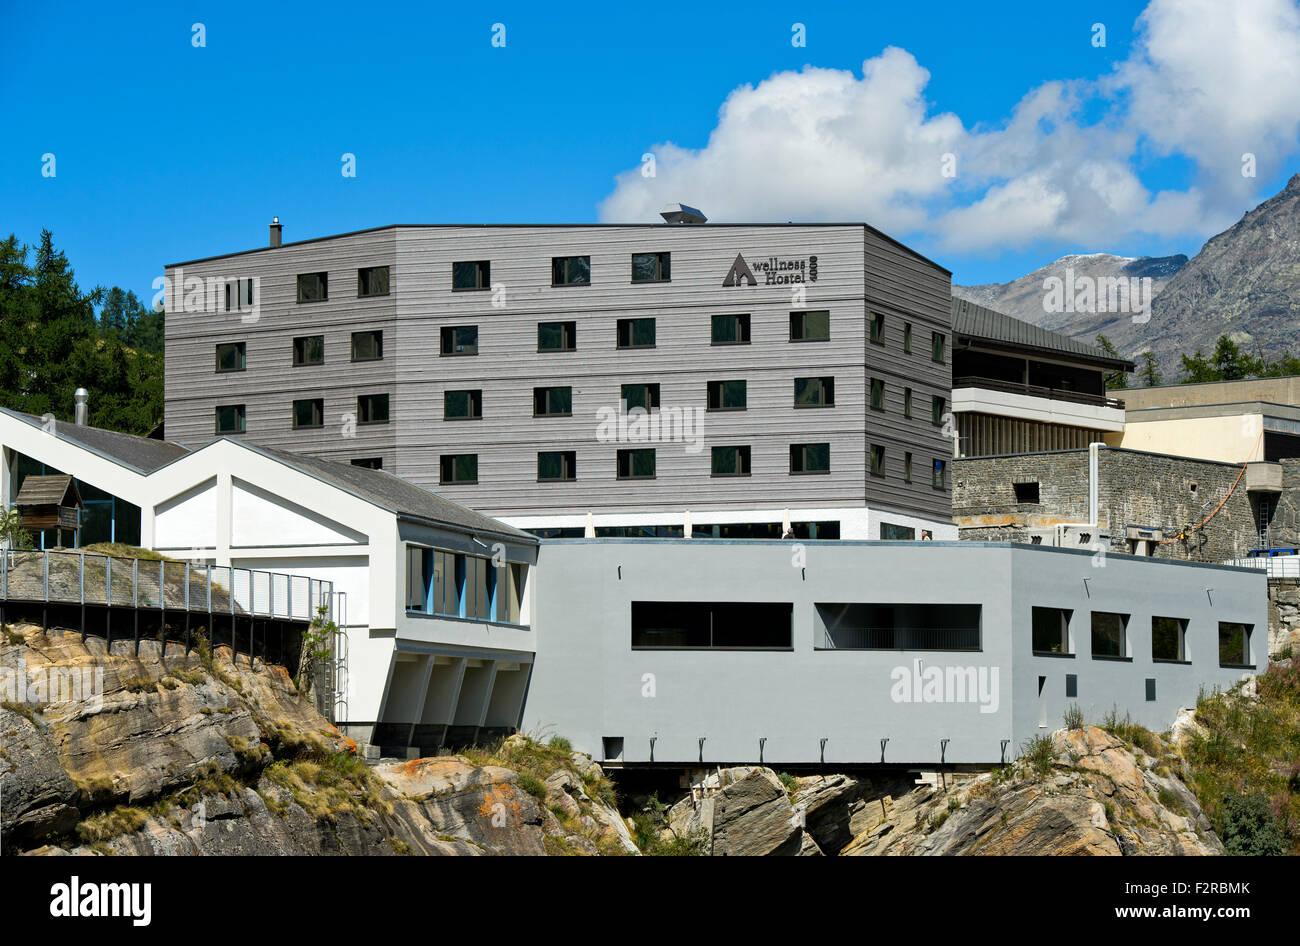 Youth hostel wellnessHostel4000, Saas-Fee, Valais, Switzerland - Stock Image